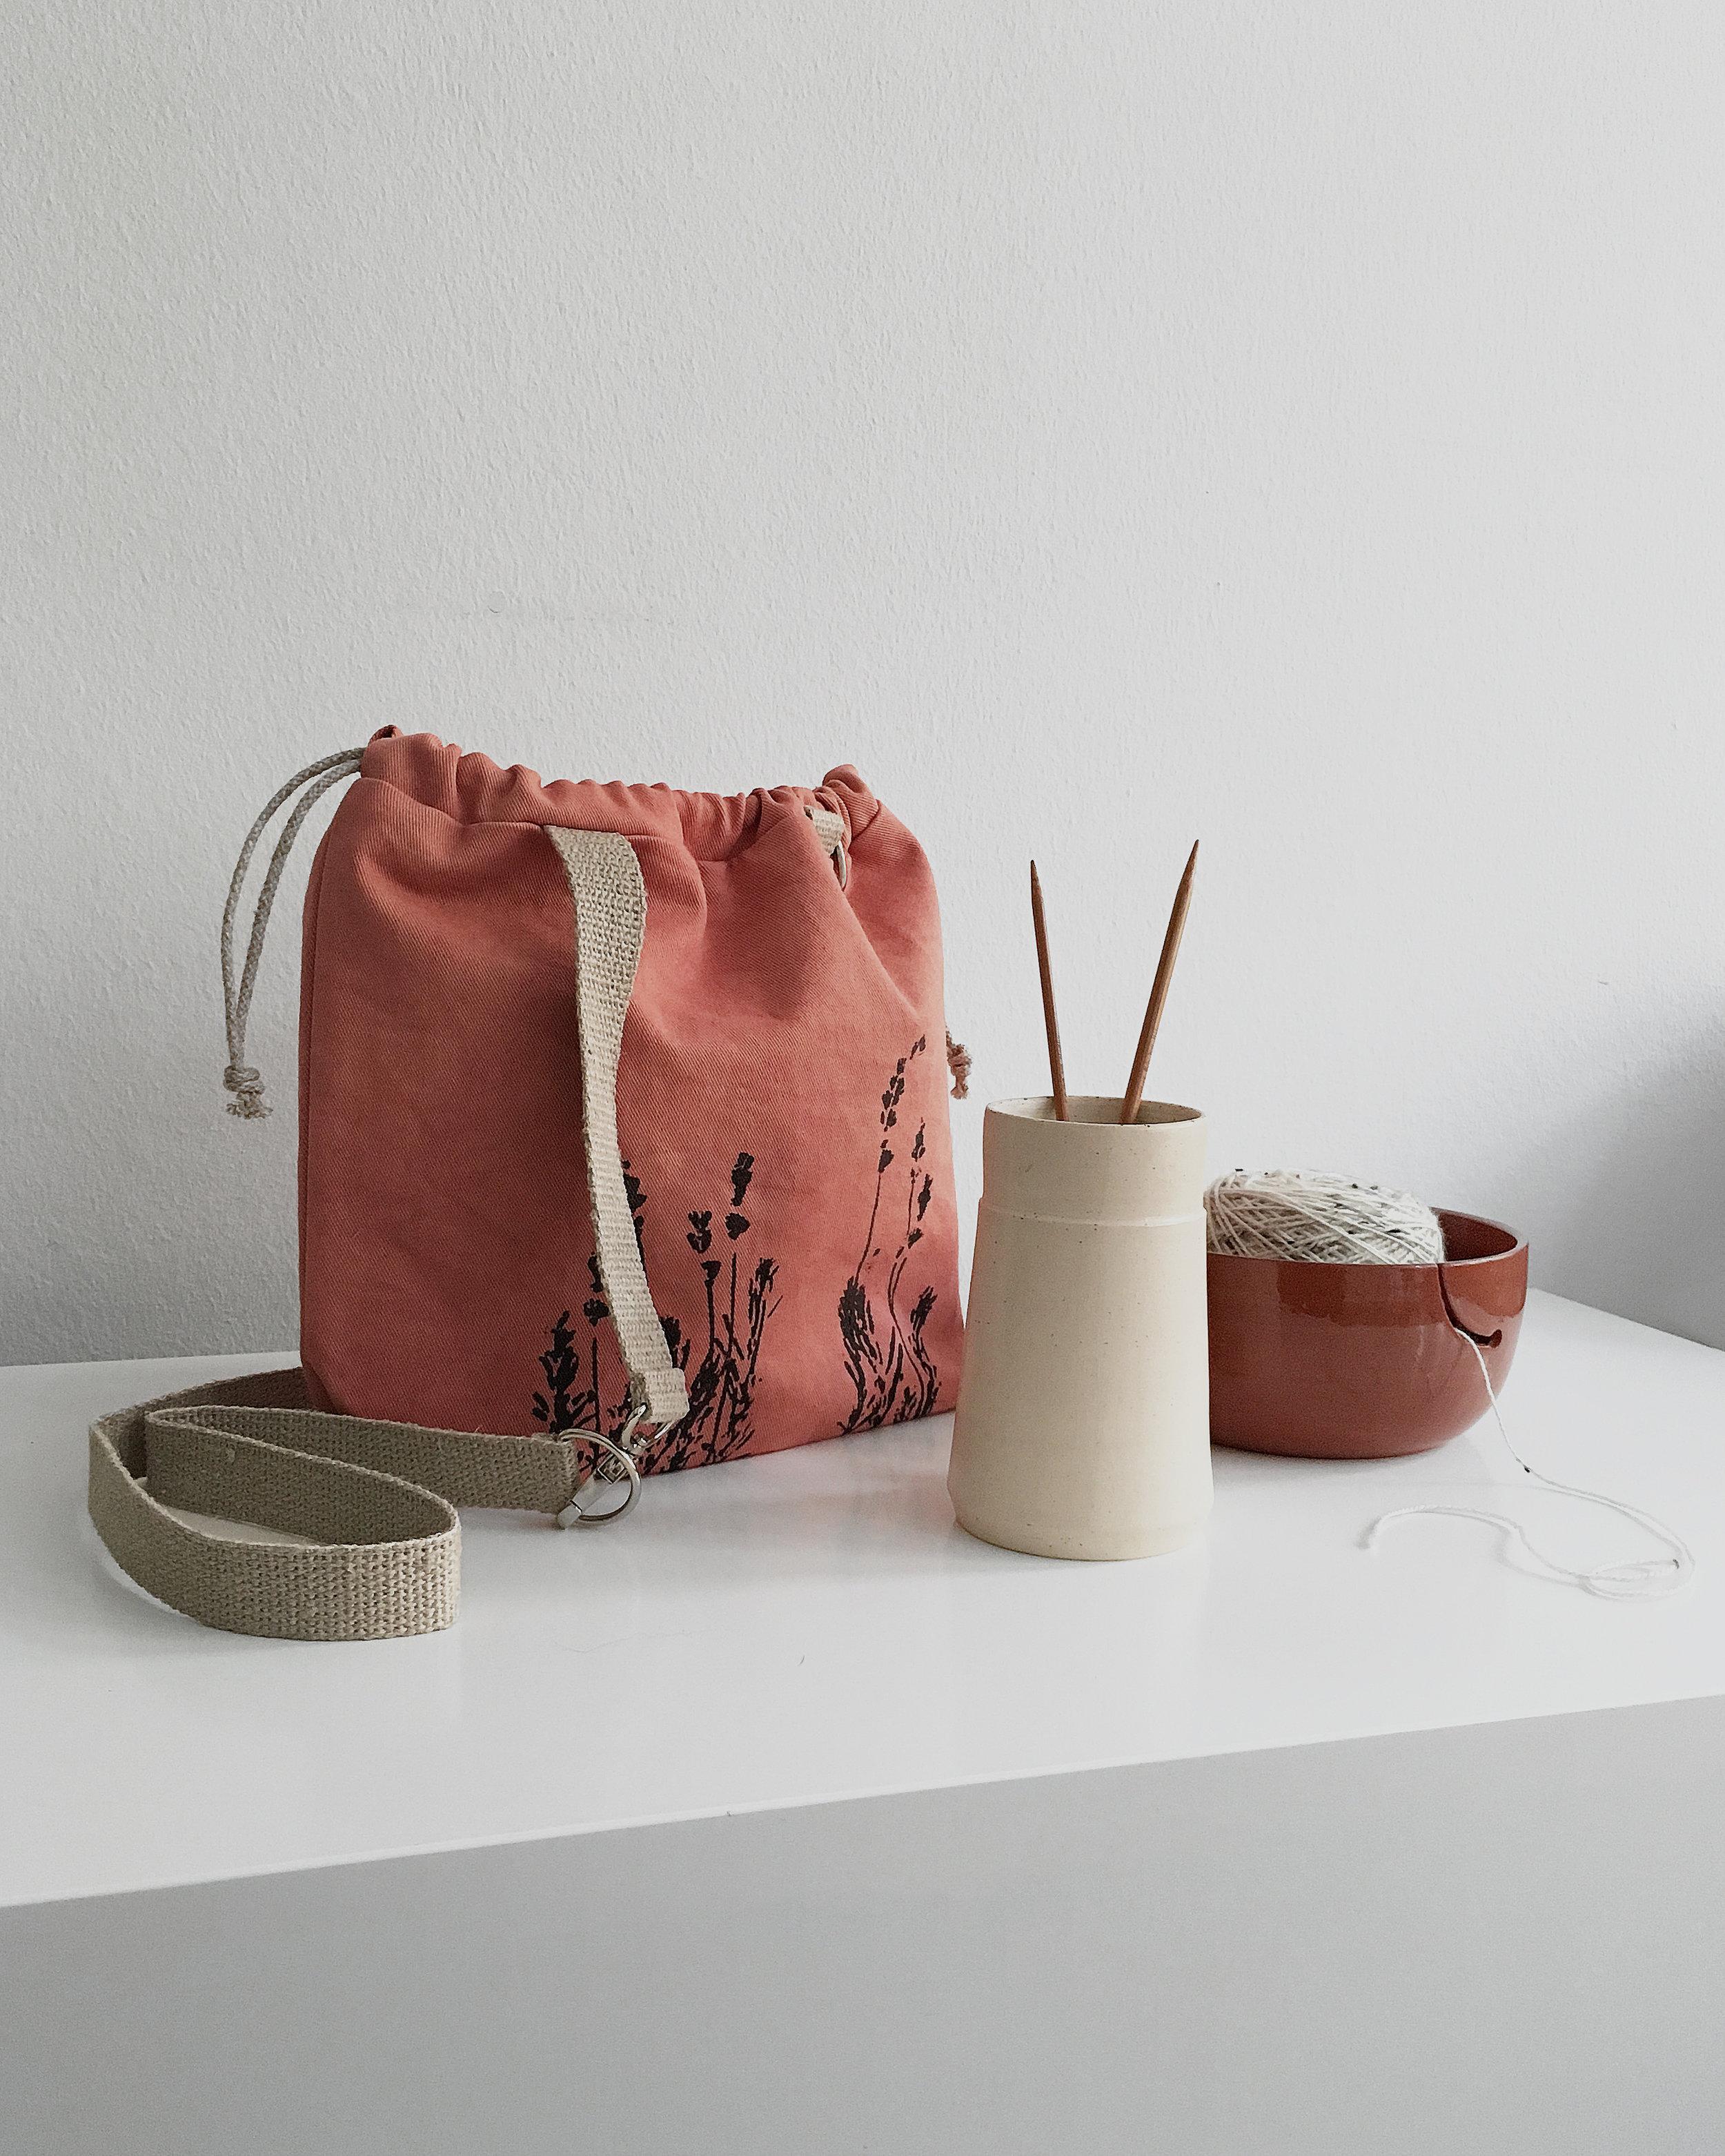 Knitting swag - handmade textiles and ceramics for mindful knitters #knitting #needlevase #ceramics #handmade